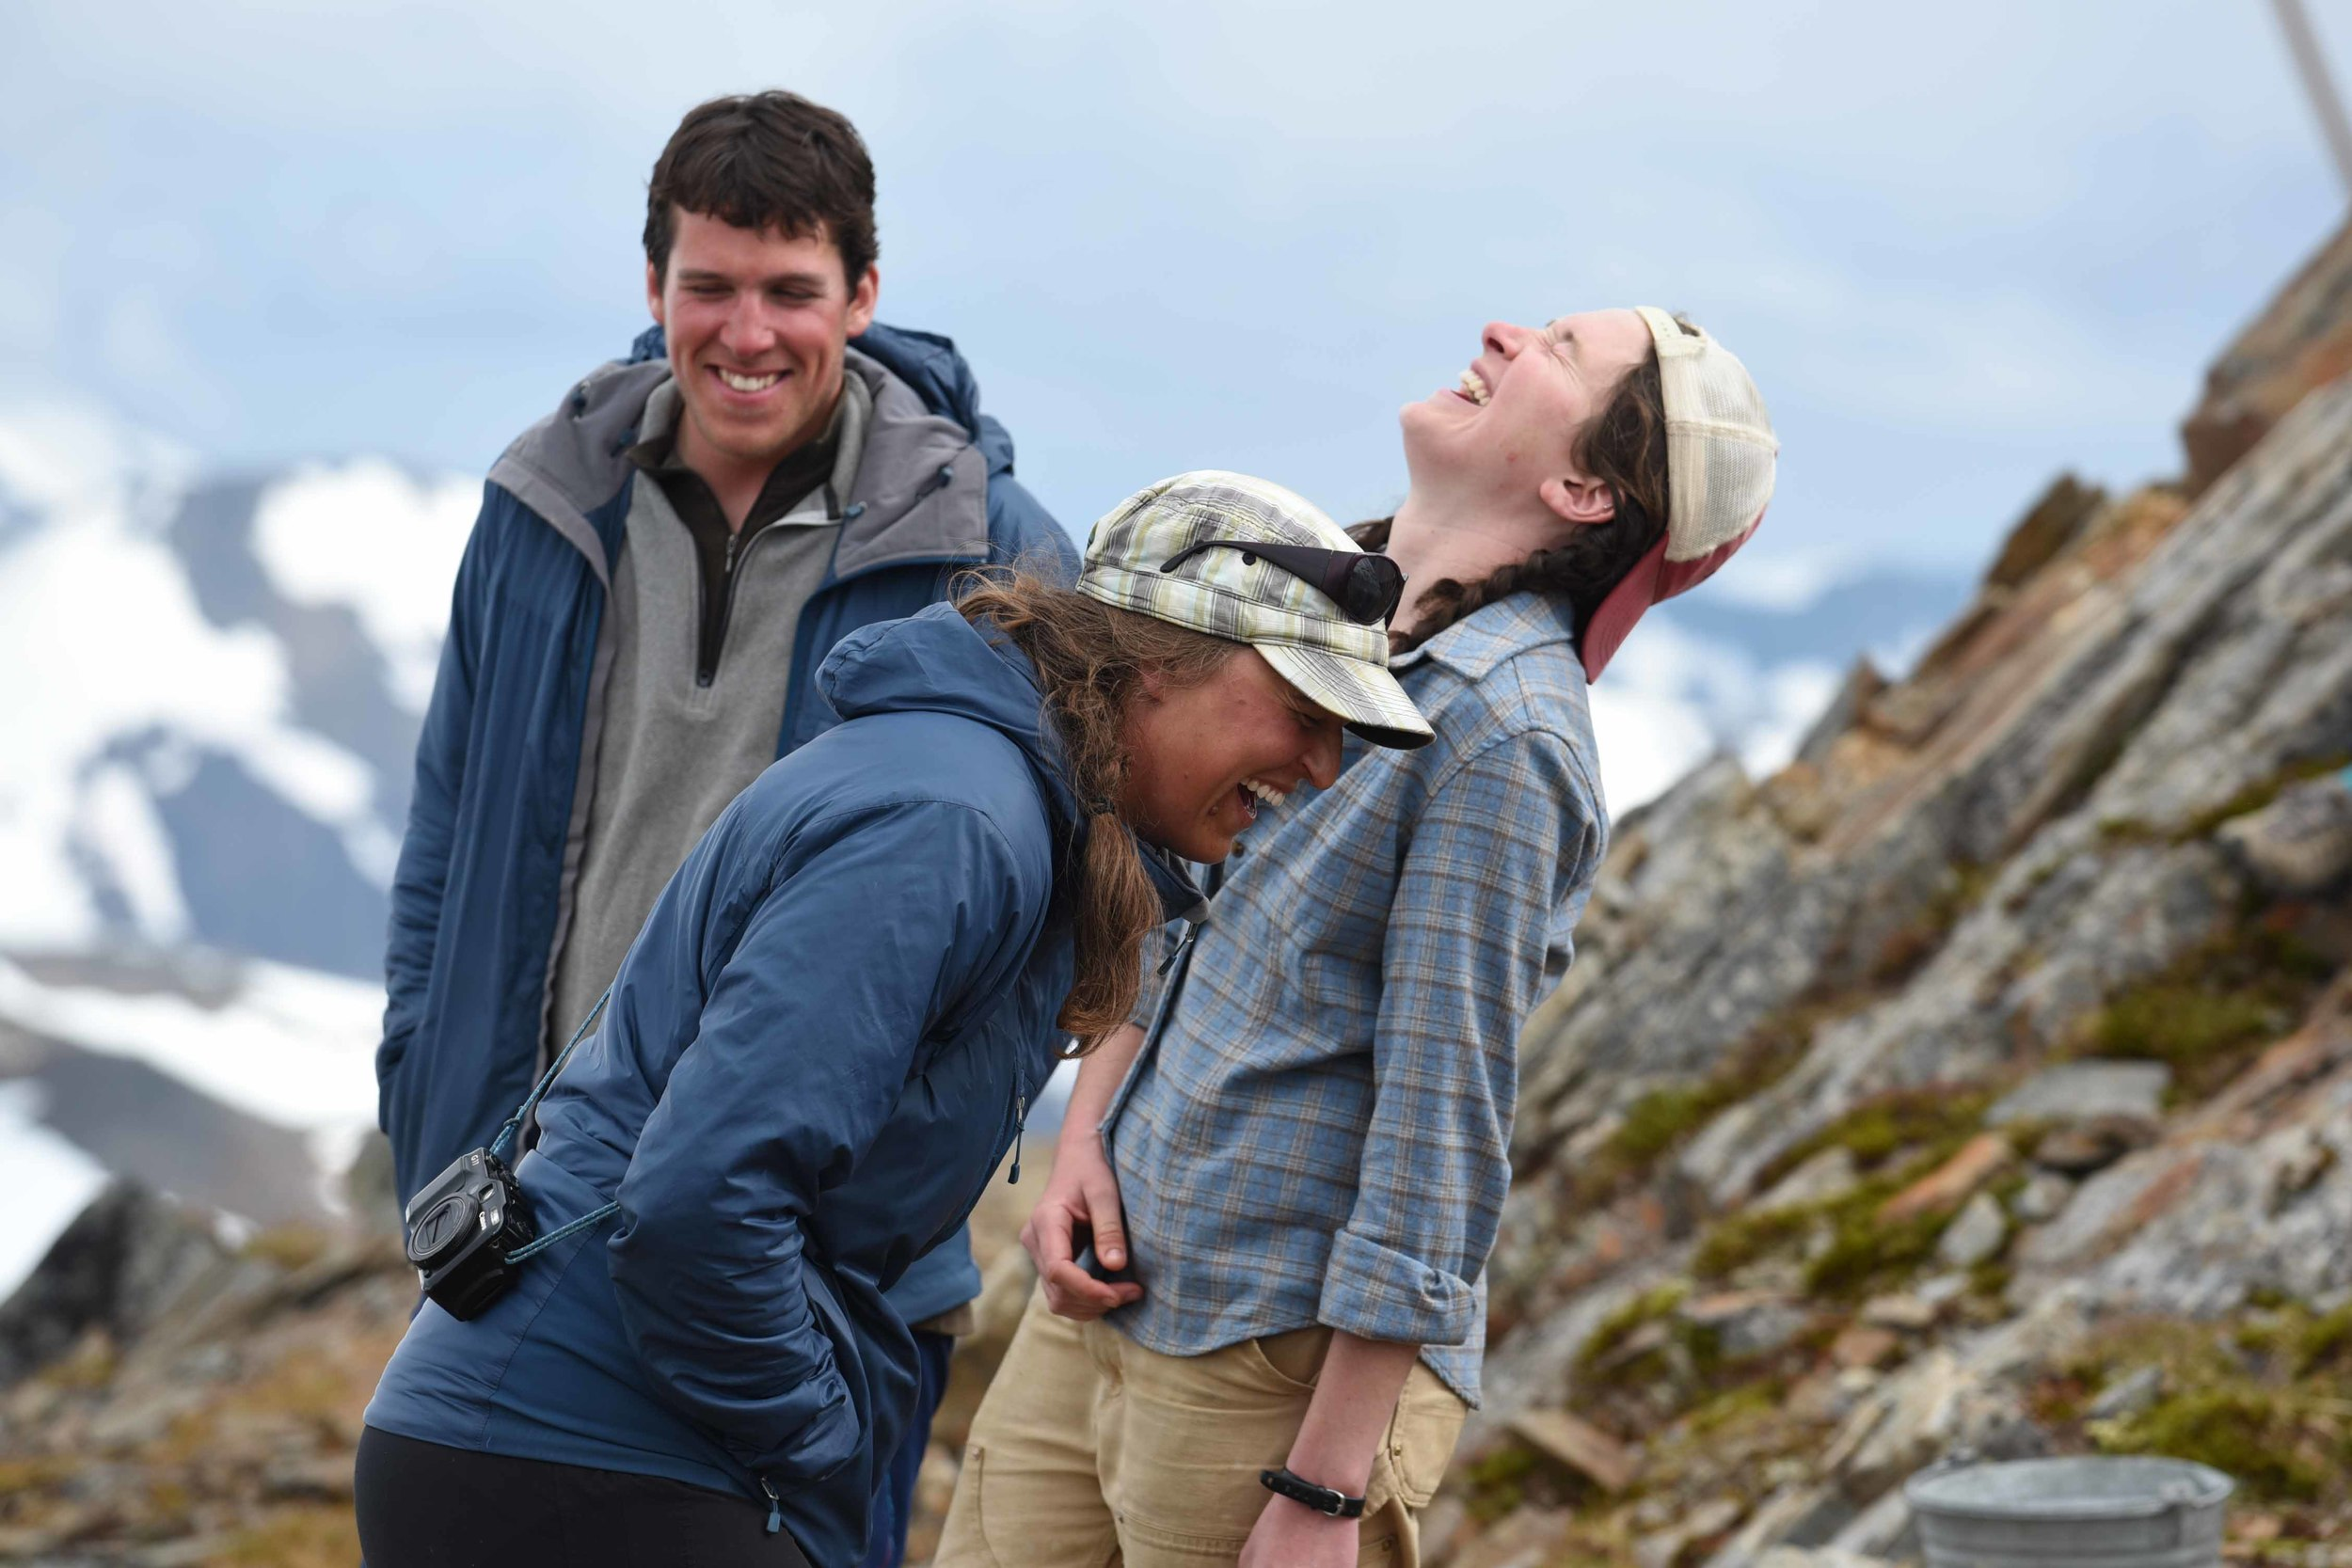 JIRP Field Staff, Matt Pickart, Allie Strel, and Annie Boucher share a laugh at Camp 17. Photo courtesy of PBJ Photography